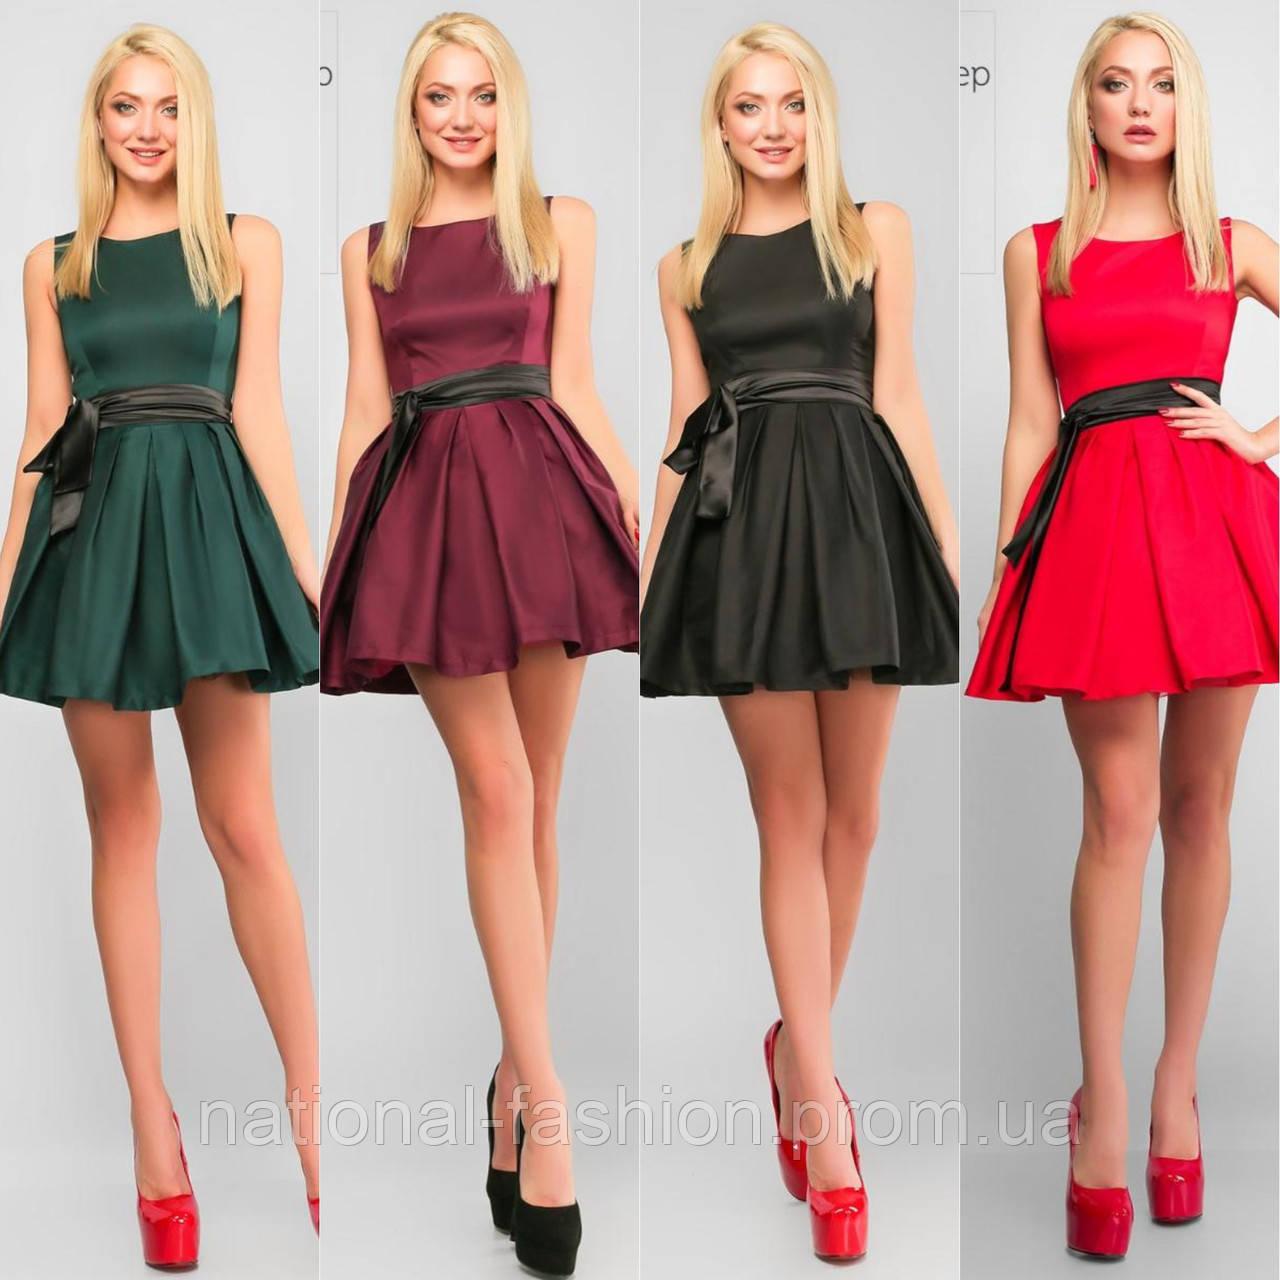 2a82a67fce3e28 Платье пышной юбкой в стиле baby doll 608 (р. 44-46), цена 1 300 грн ...